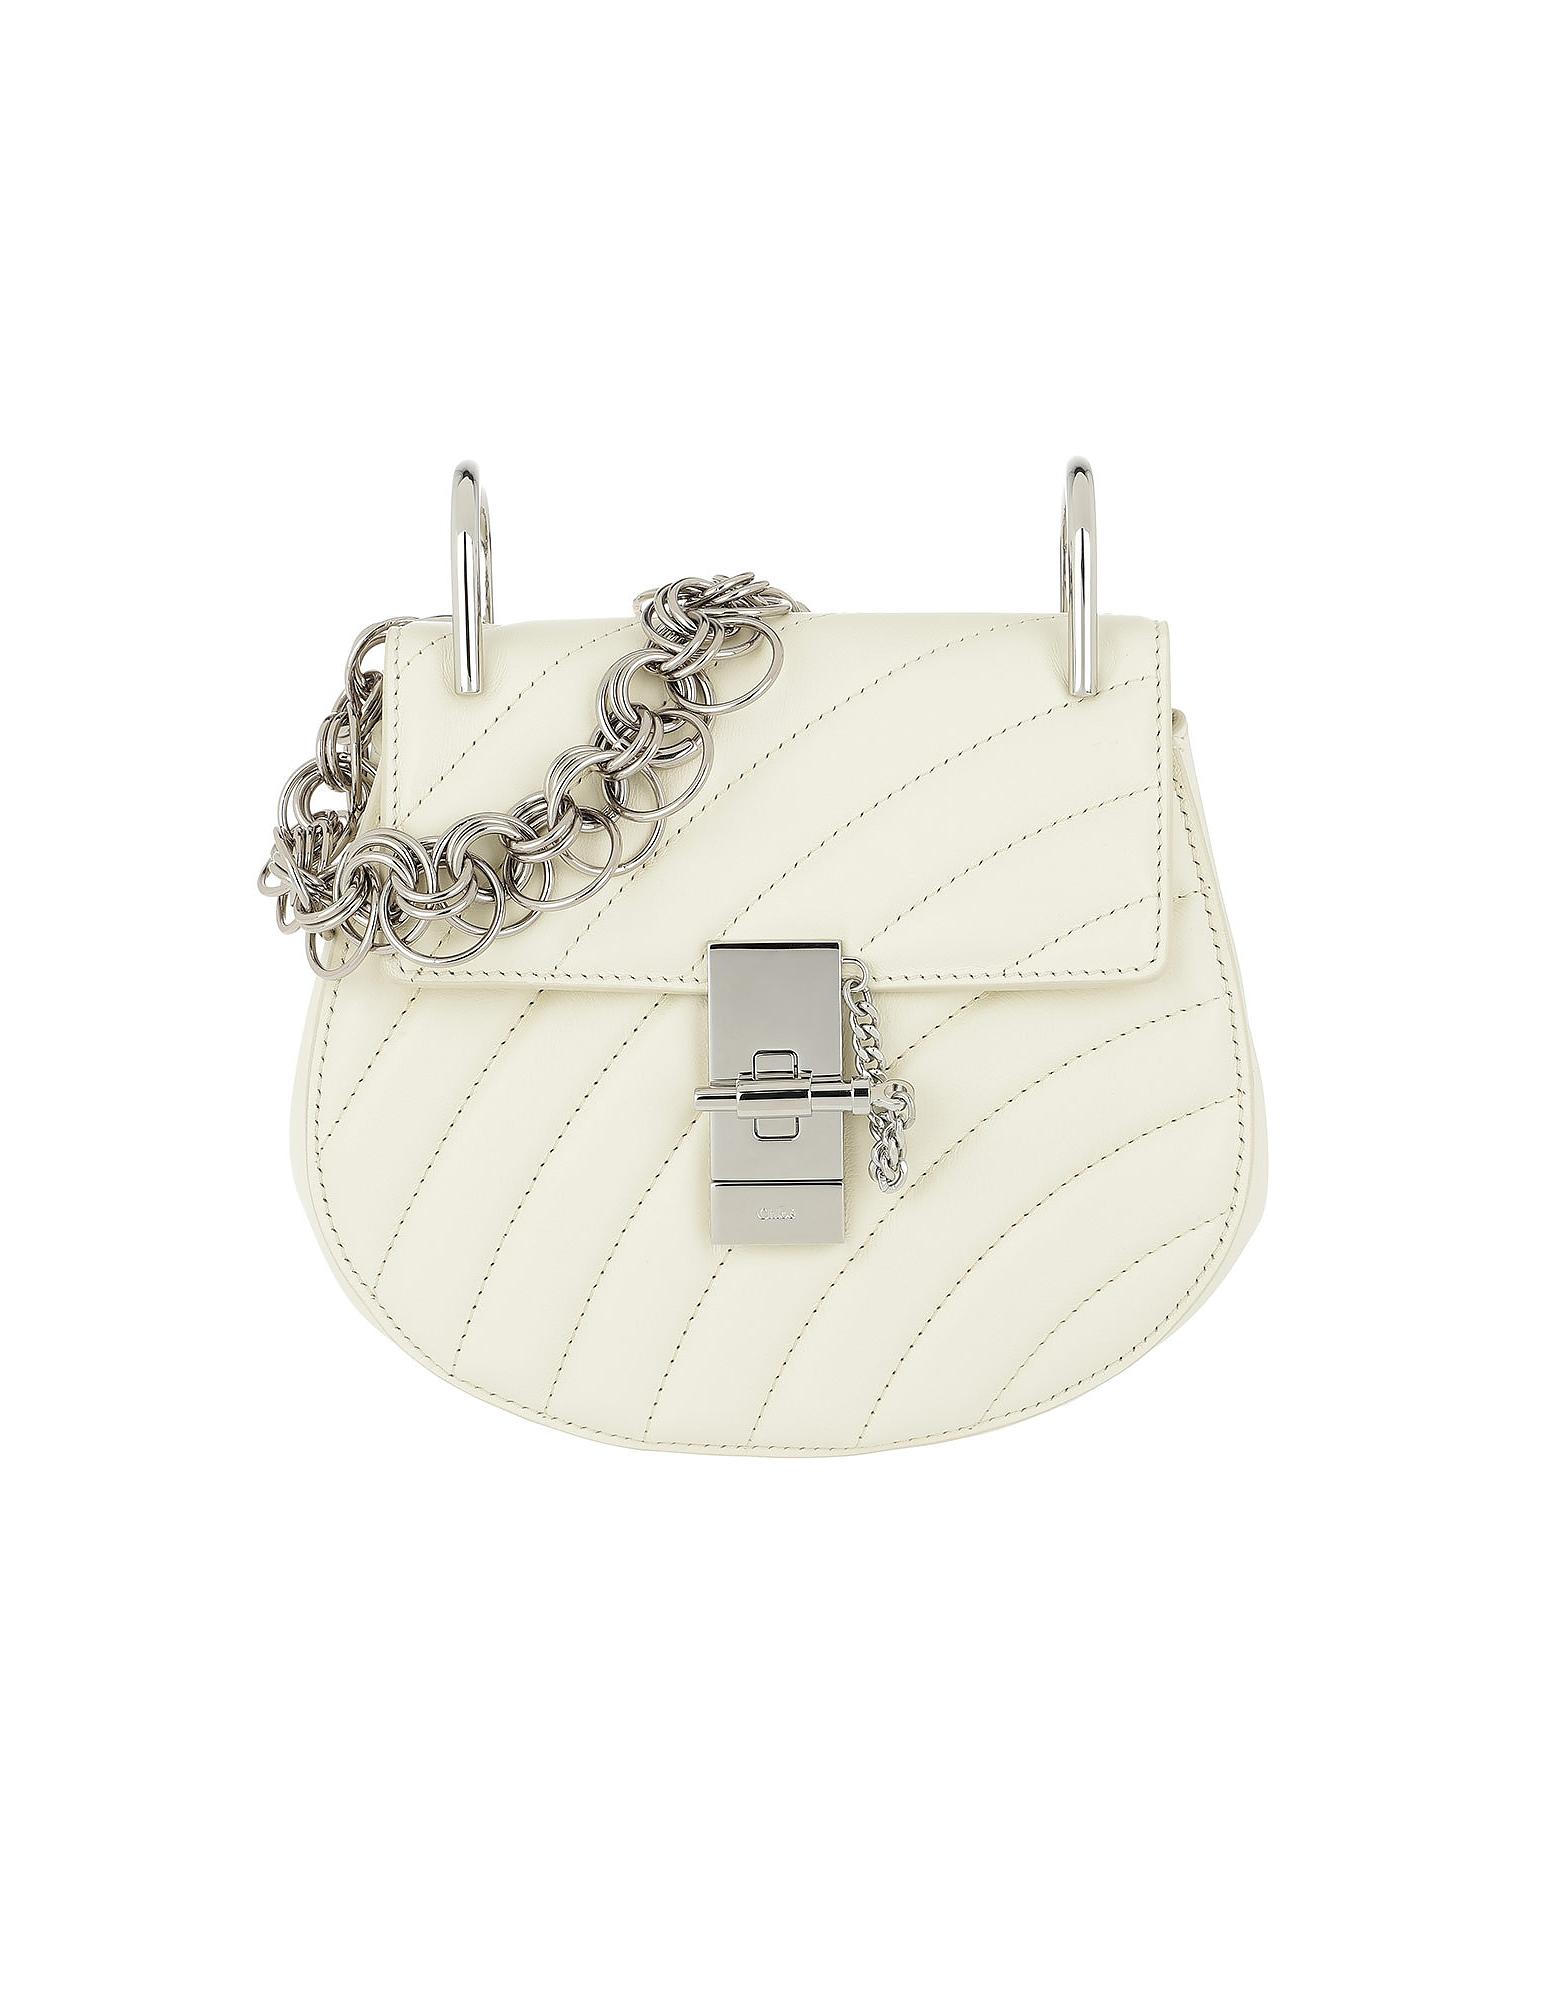 Chloe Handbags, Drew Bijou Mini Quilted Leather Natural White